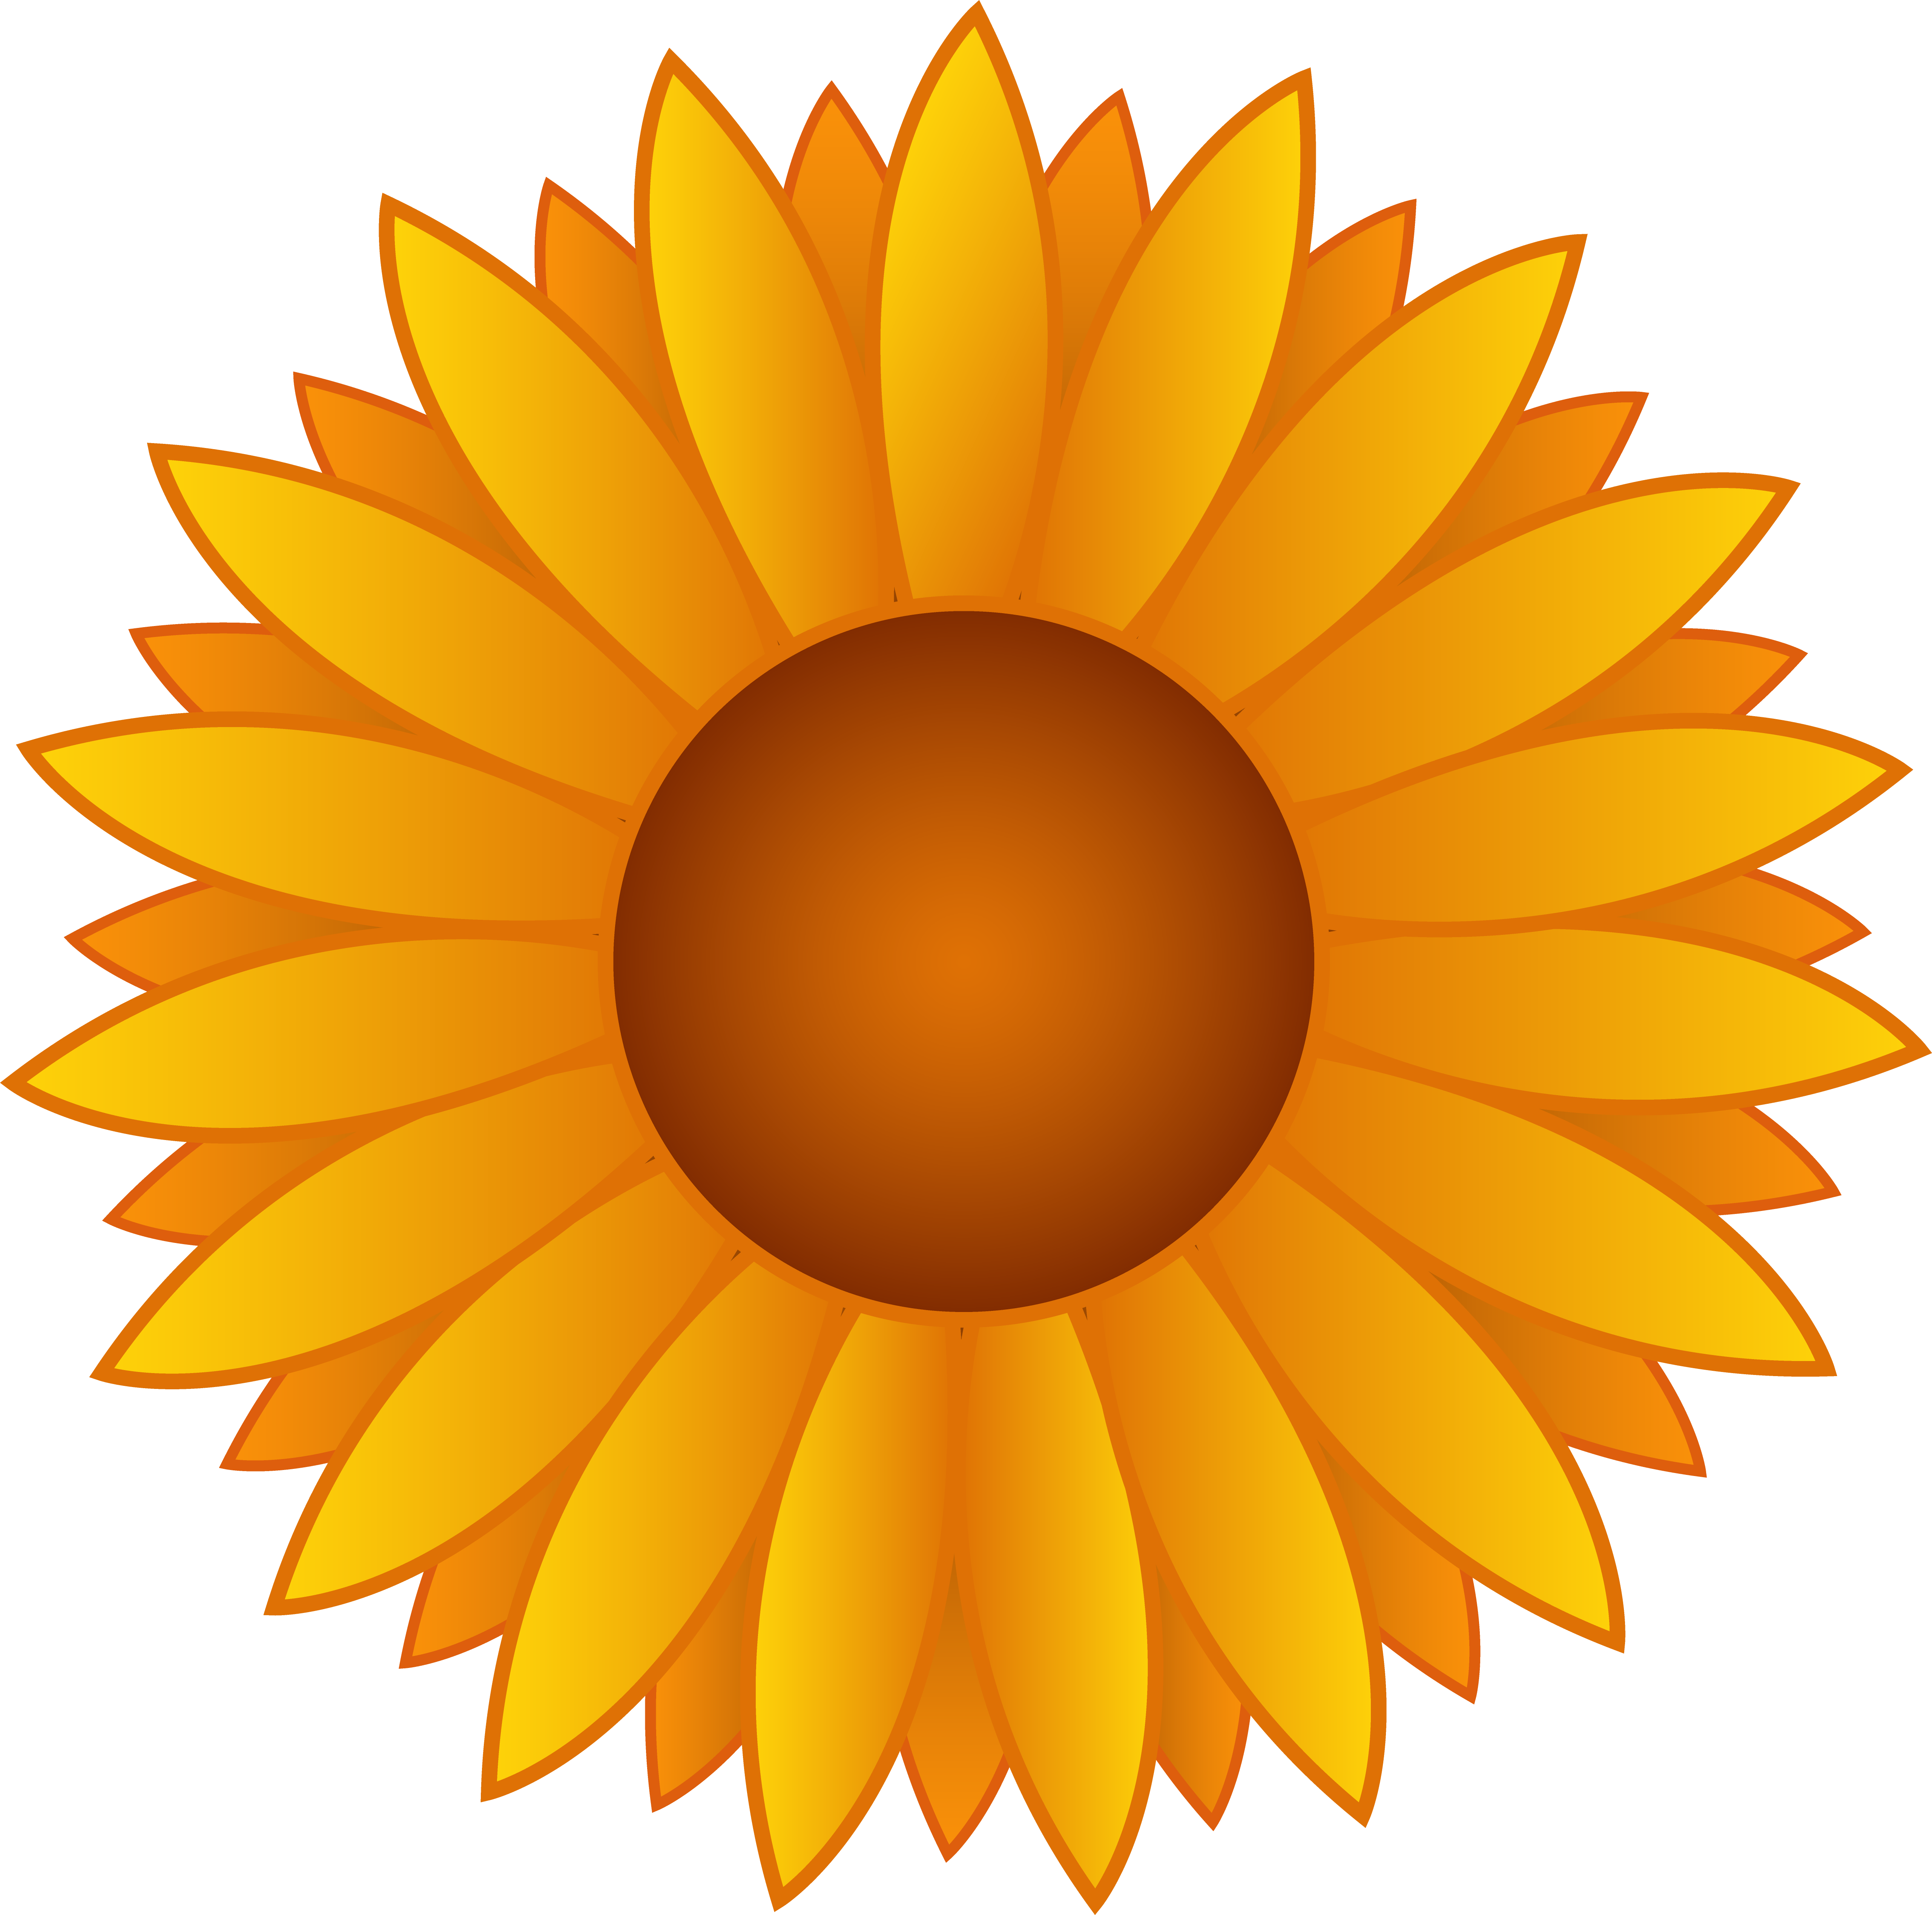 clip art freeuse Sunflowers clipart. Sunflower clip art free.